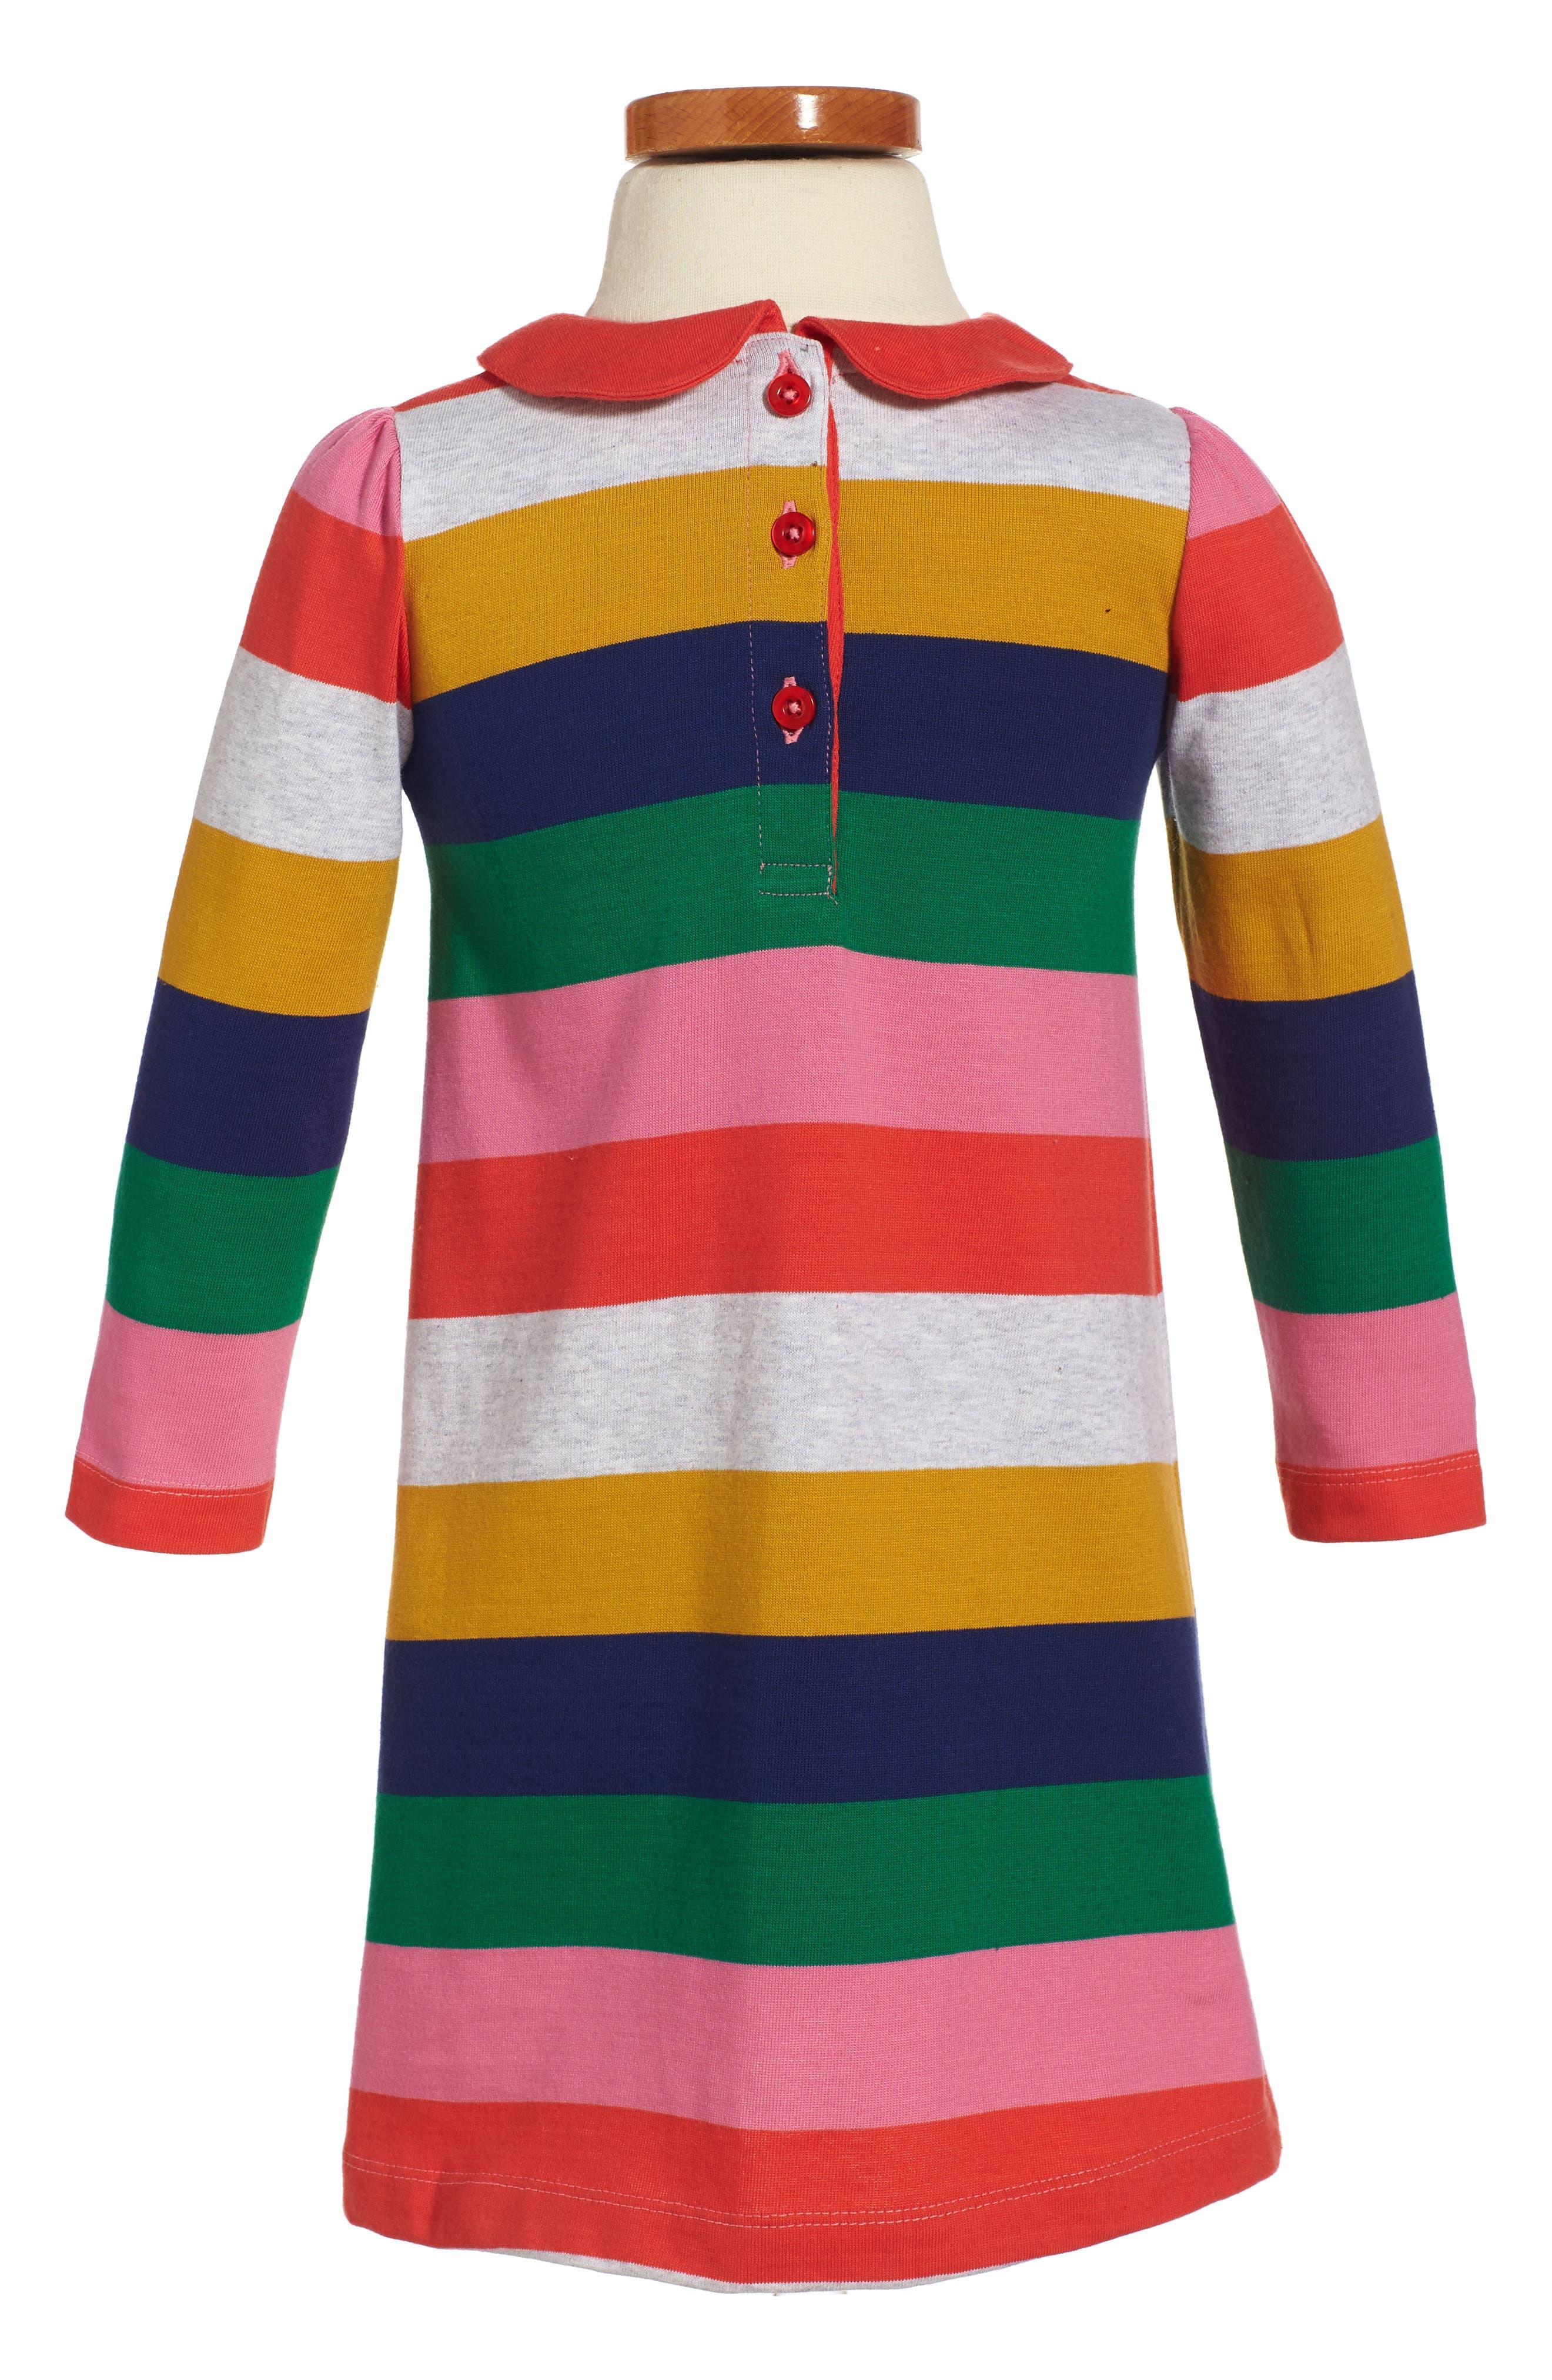 Alternate Image 2  - Mini Boden Collared Jersey Dress (Toddler Girls, Little Girls & Big Girls)